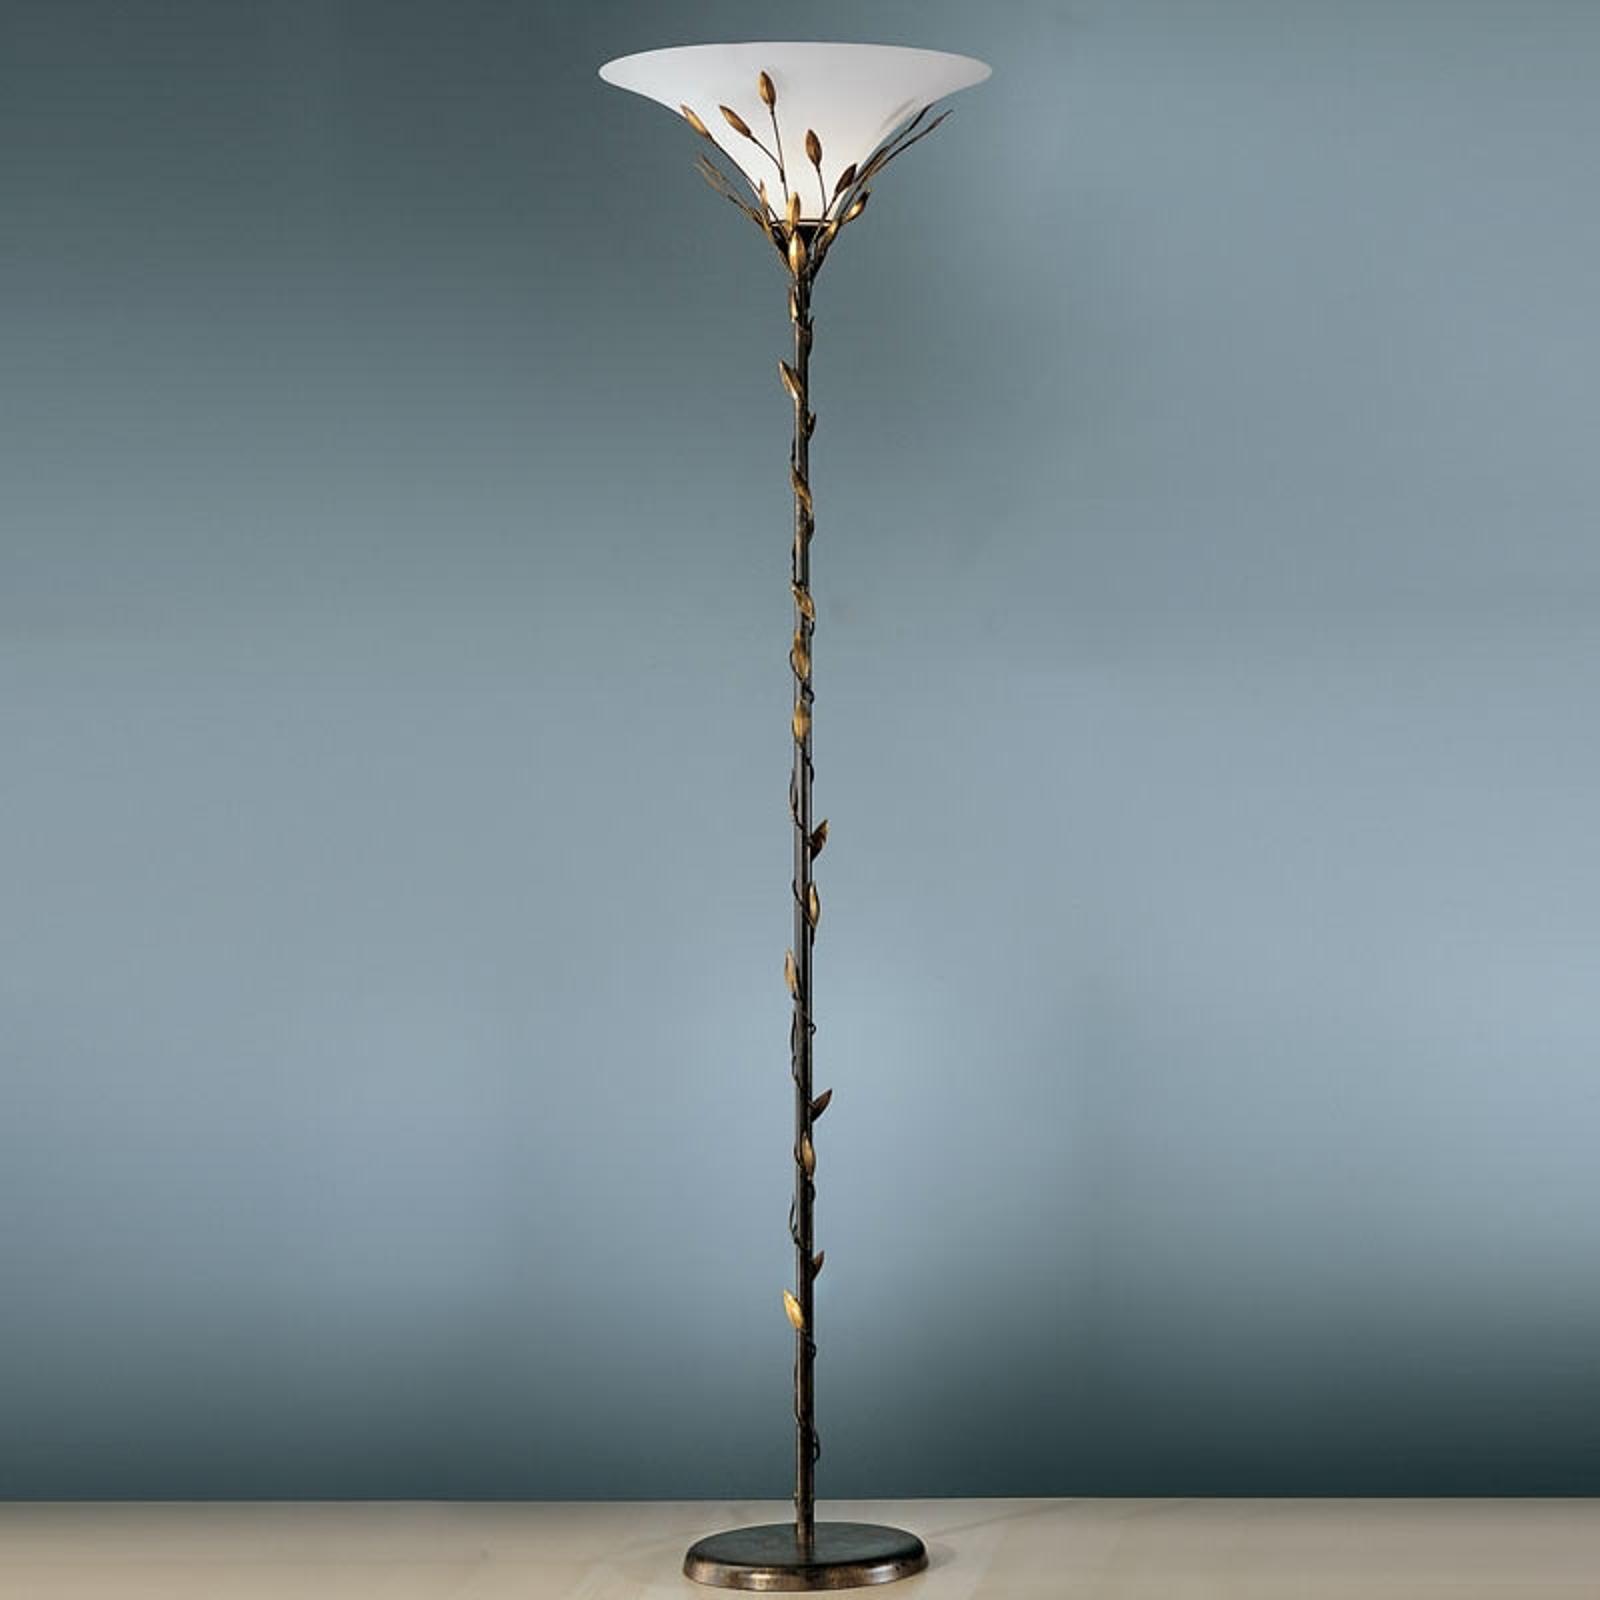 Vloerlamp CAMPANA by Uta Kögl